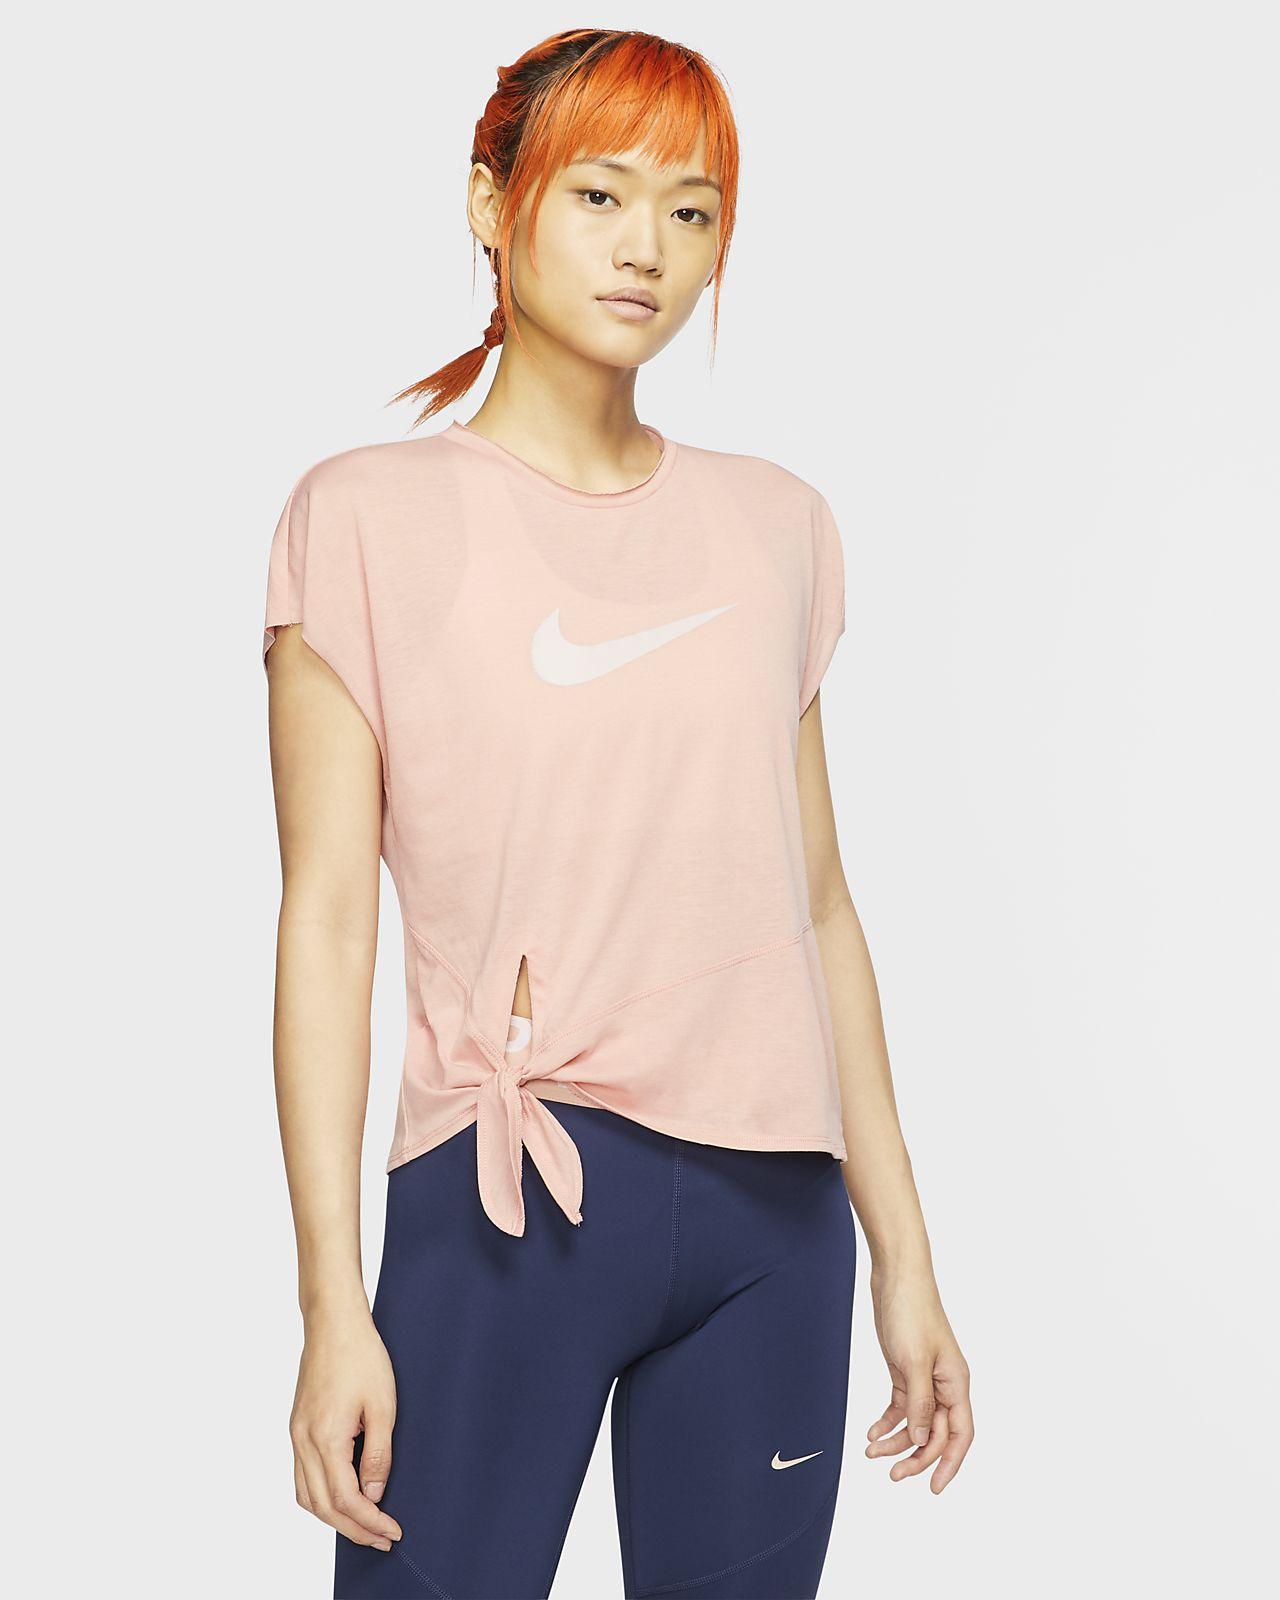 Nike Dri-FIT rövid ujjú női edzőfelső